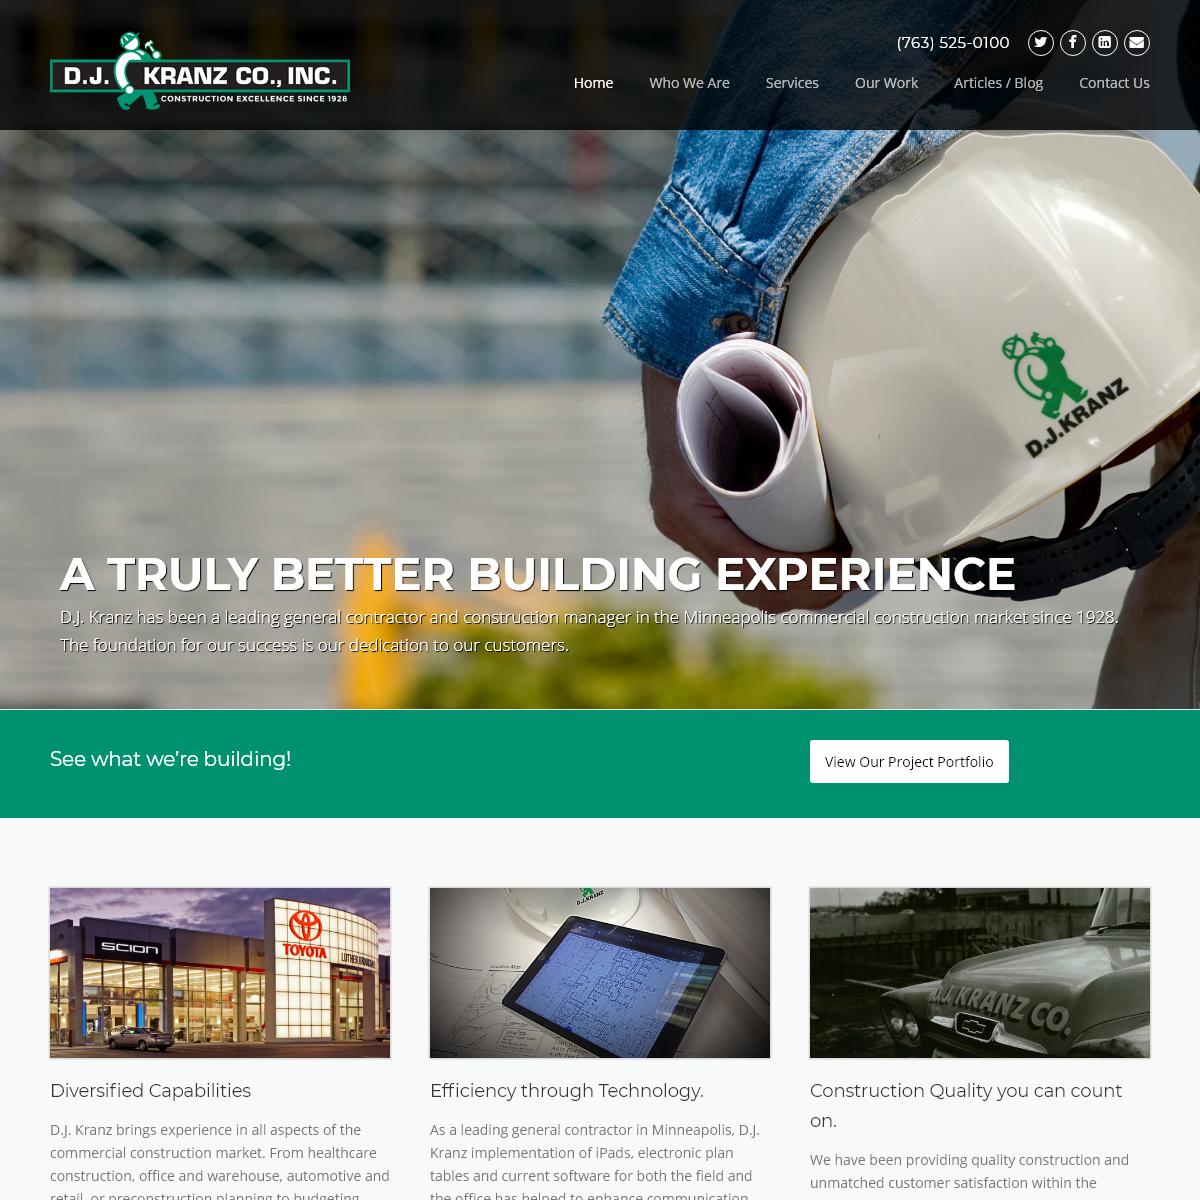 D.J. Kranz – General contractors and construction managers